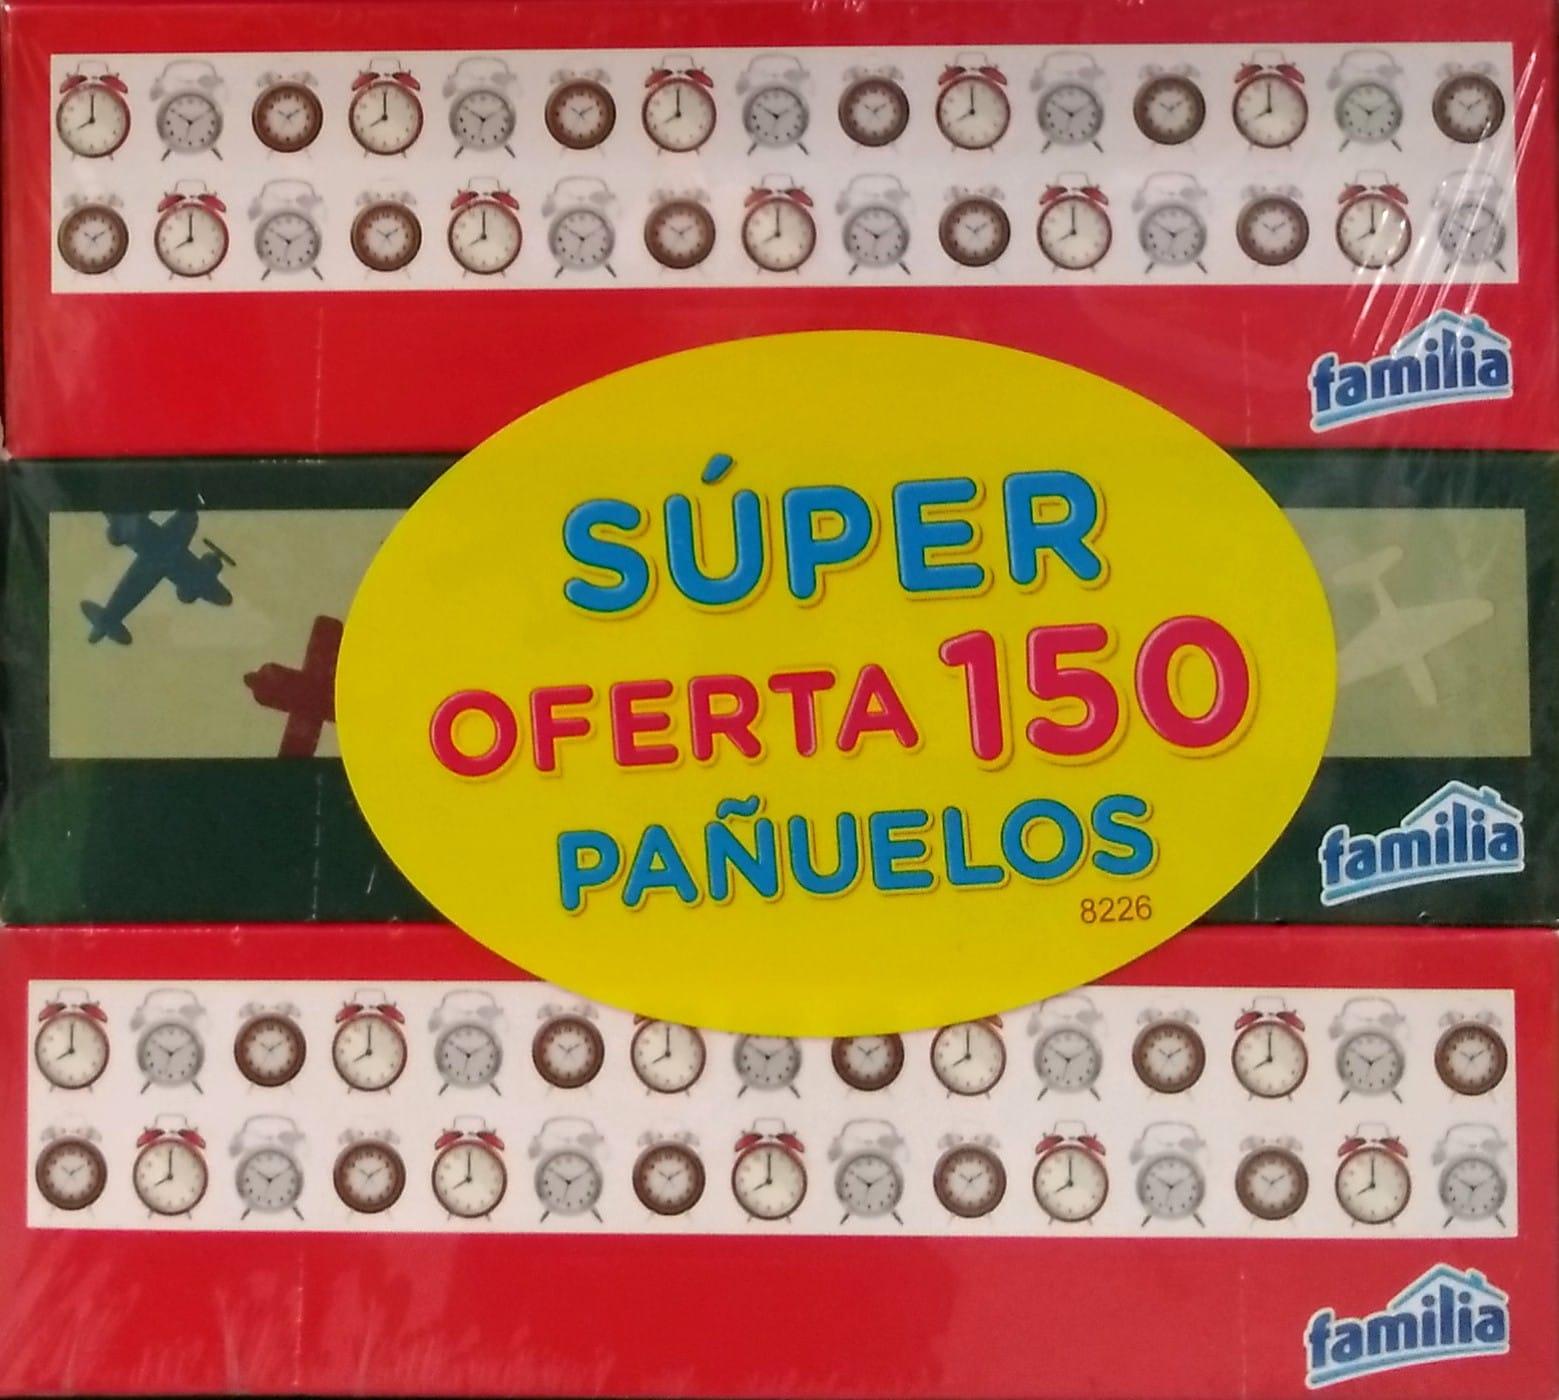 Pañuelos Familia Caja Pequeña 50un x3